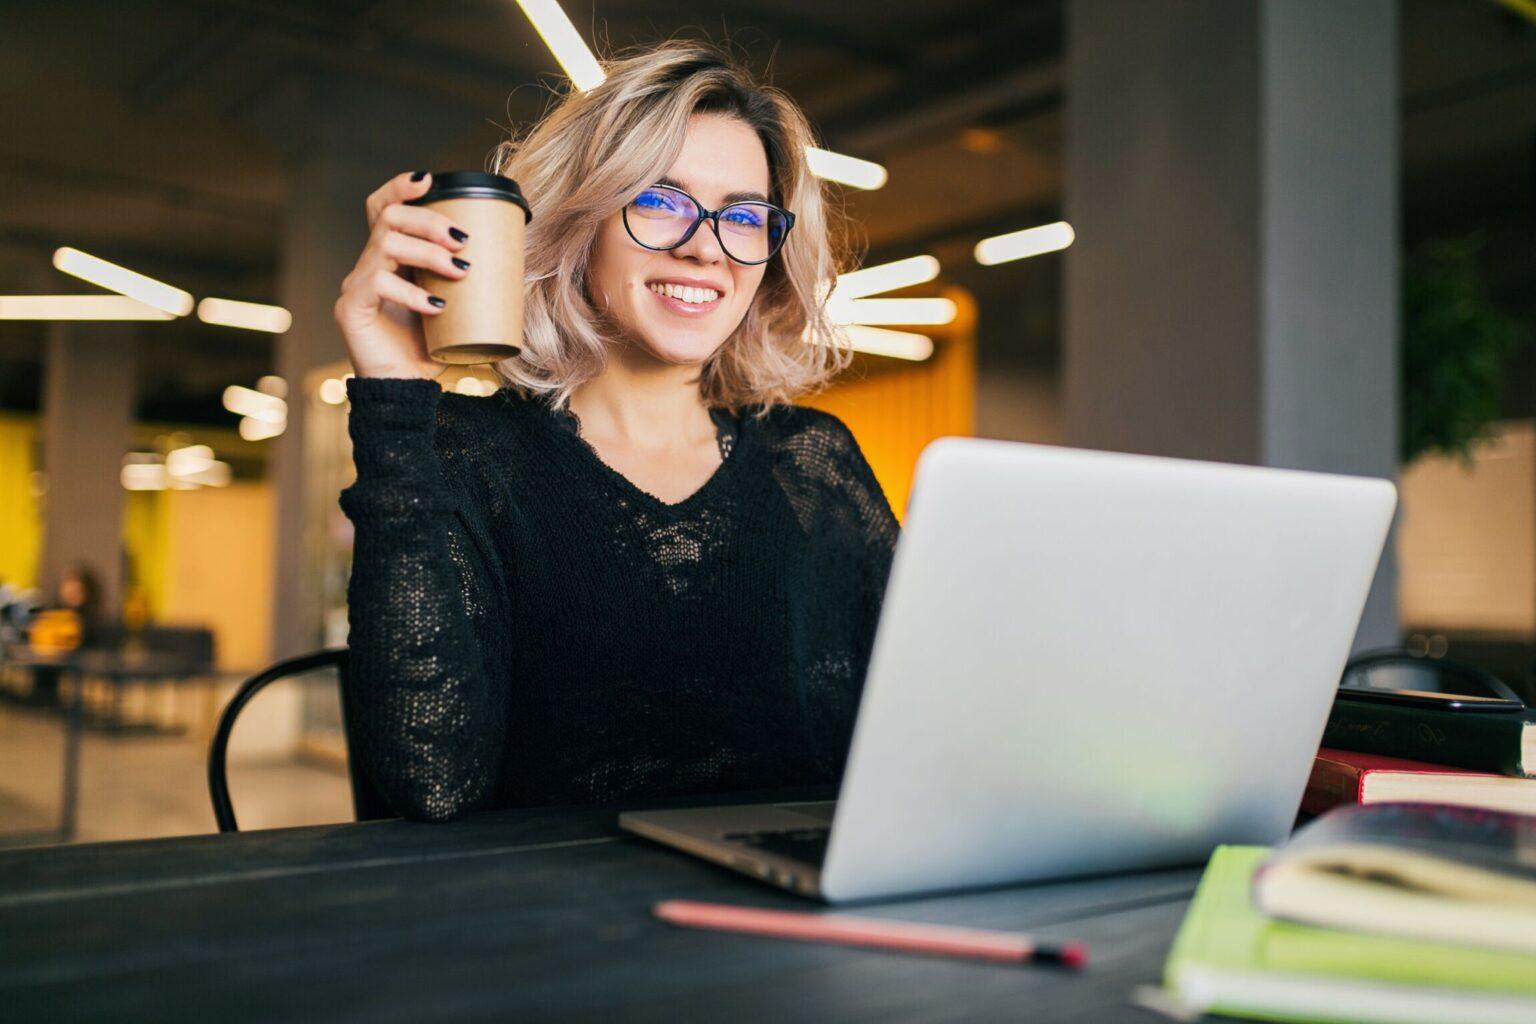 autoimprenditorialità femminile | empowerment femminile | sviluppo competenze finanziarie